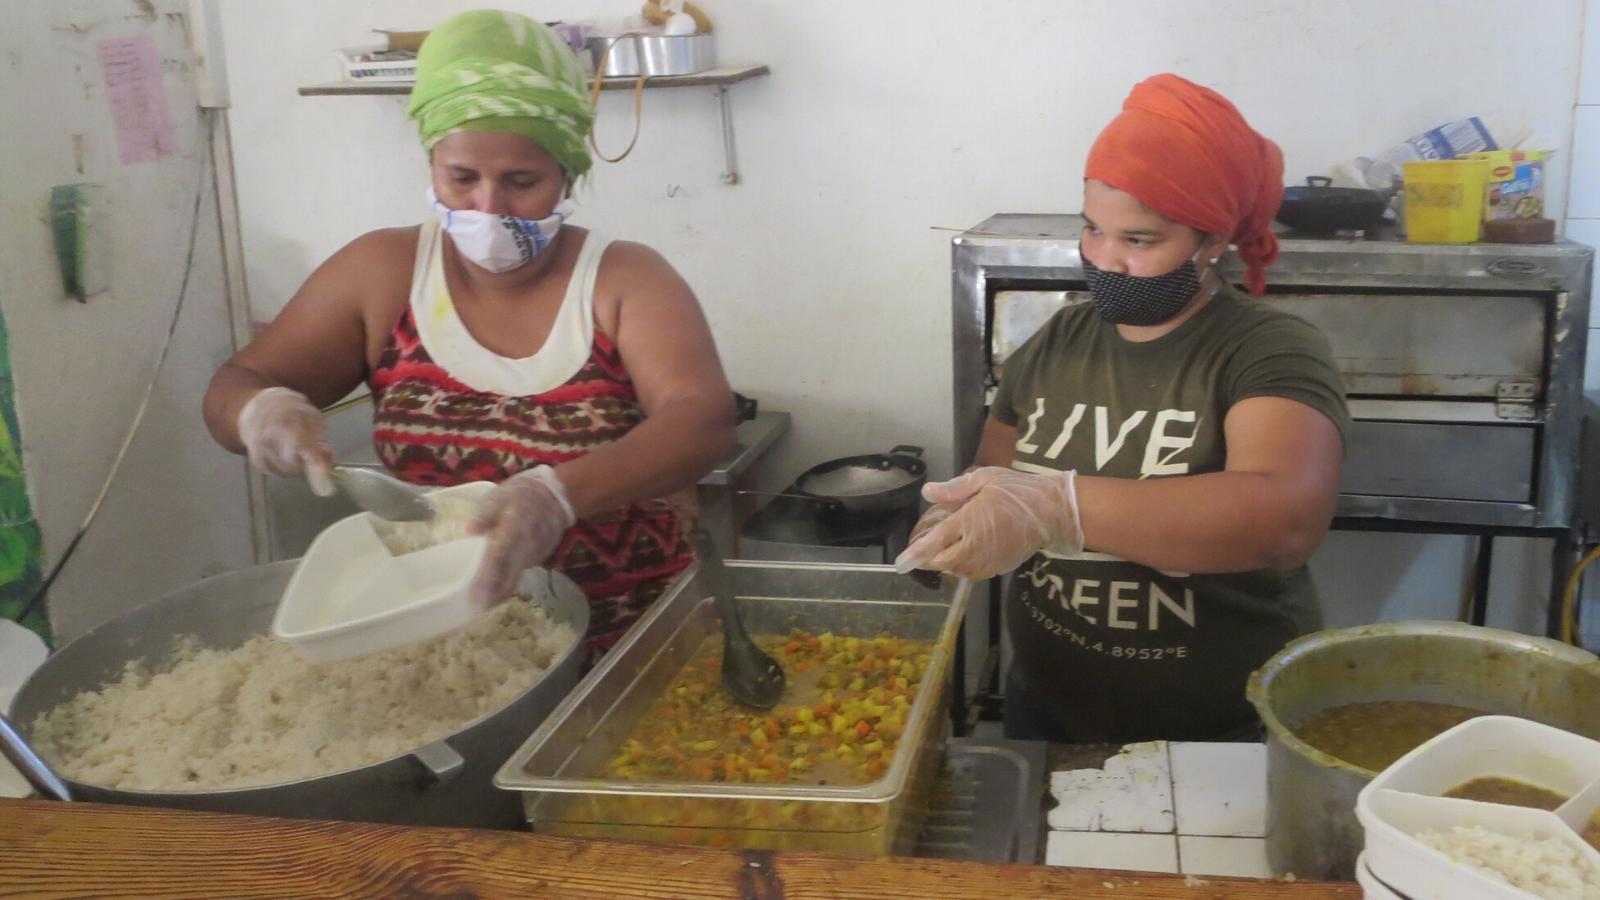 El restaurante que pasó de vender langosta a donar 600 almuerzos diarios